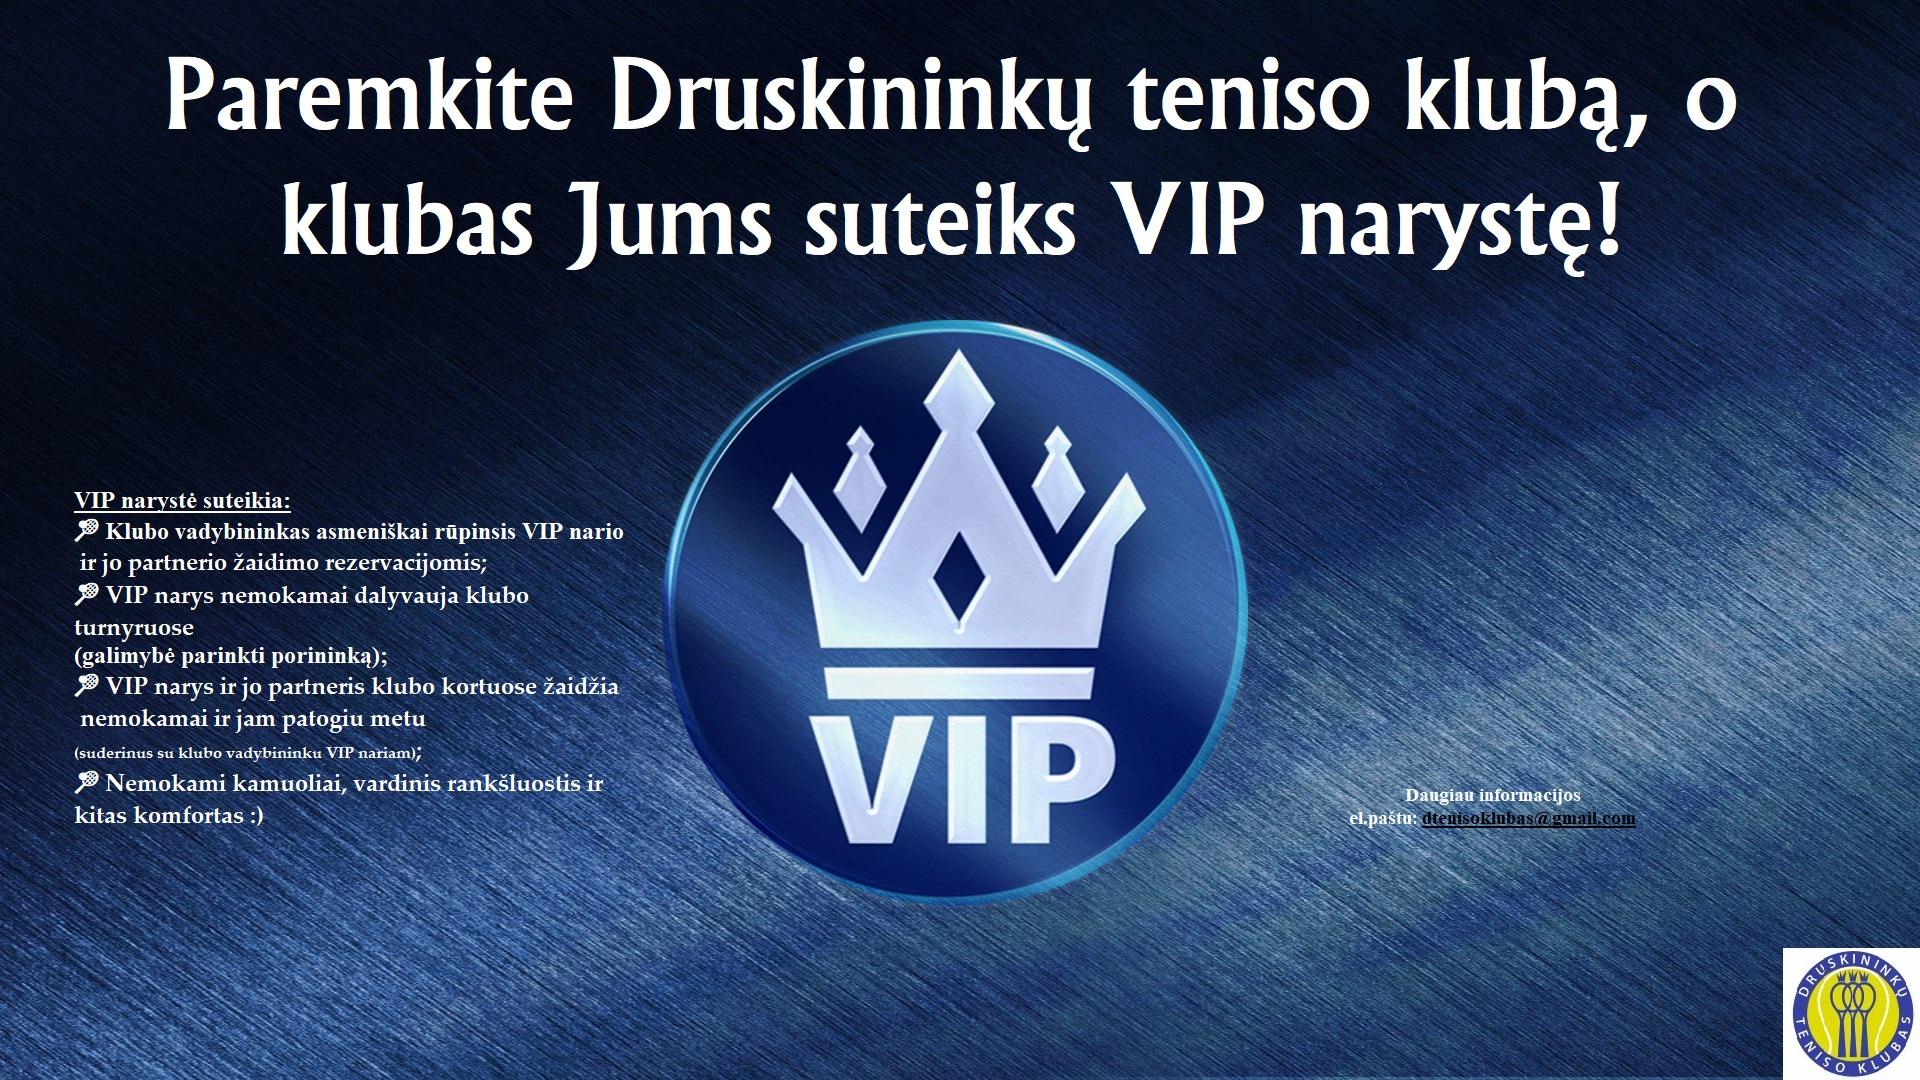 VIP naryste